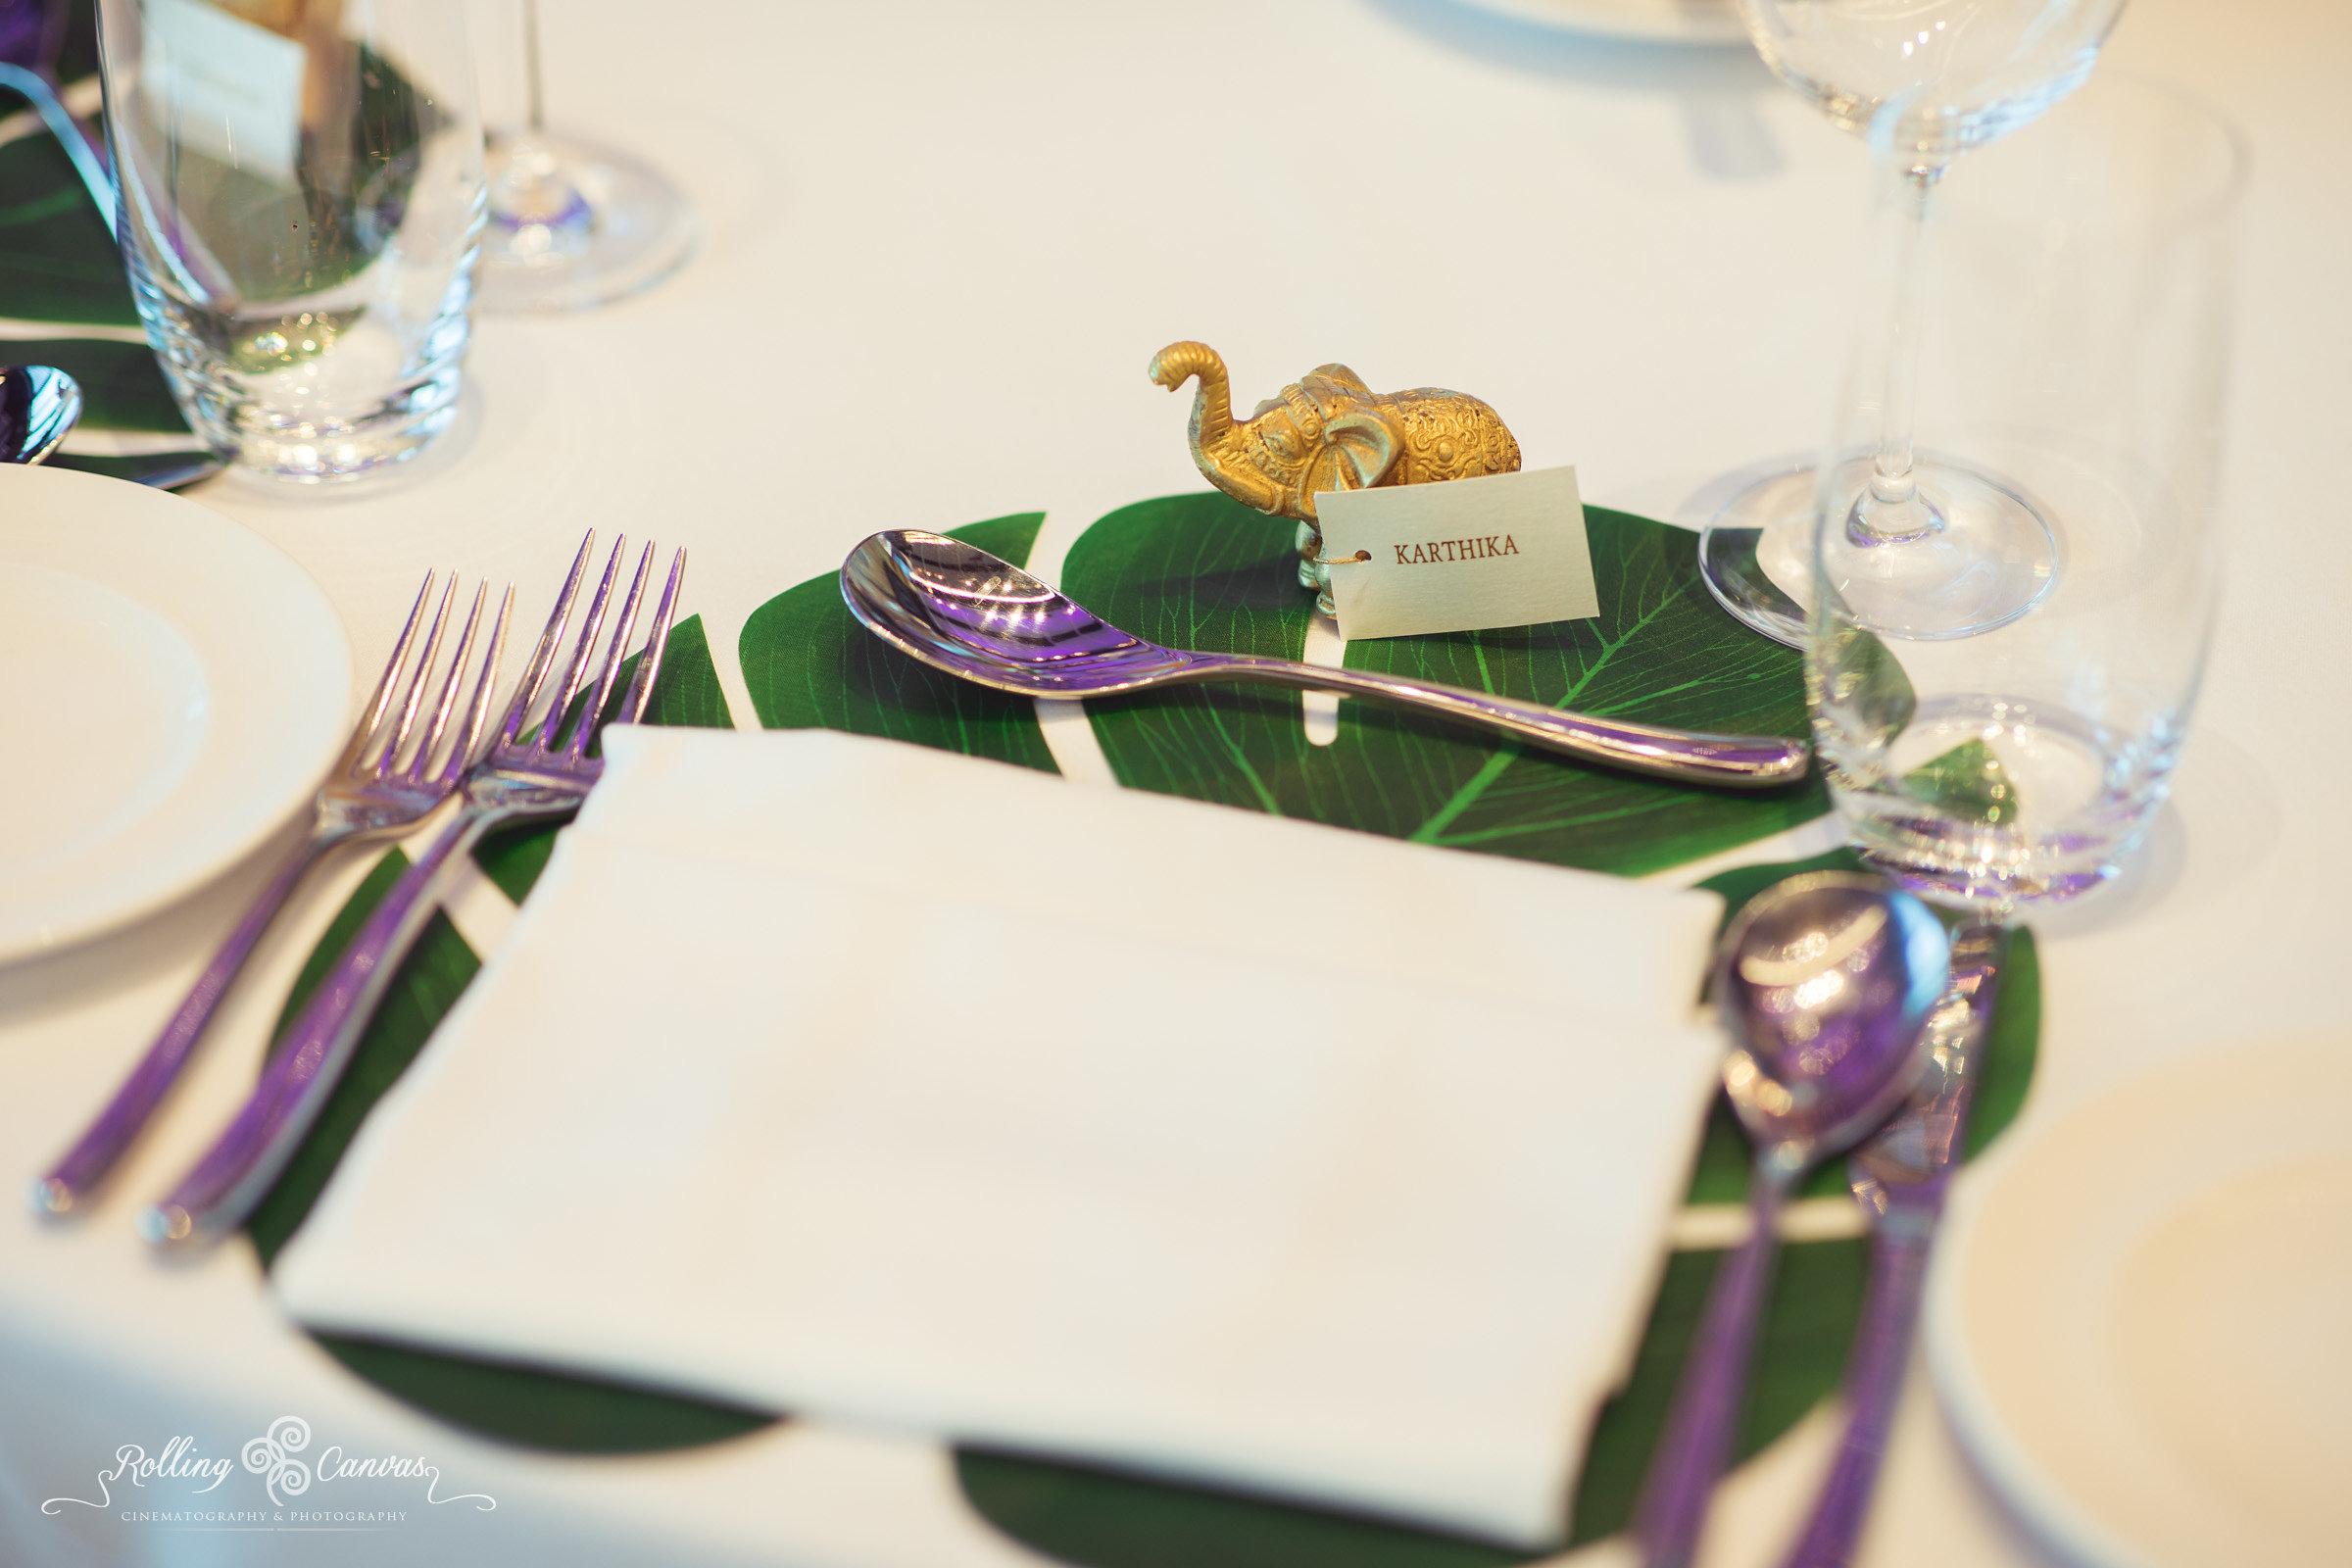 Wedding_Photography_Sydney_Rolling_Canvas_Presentation_Place_Setting_Hindu_Ceremony_Name_Card-57070.jpg